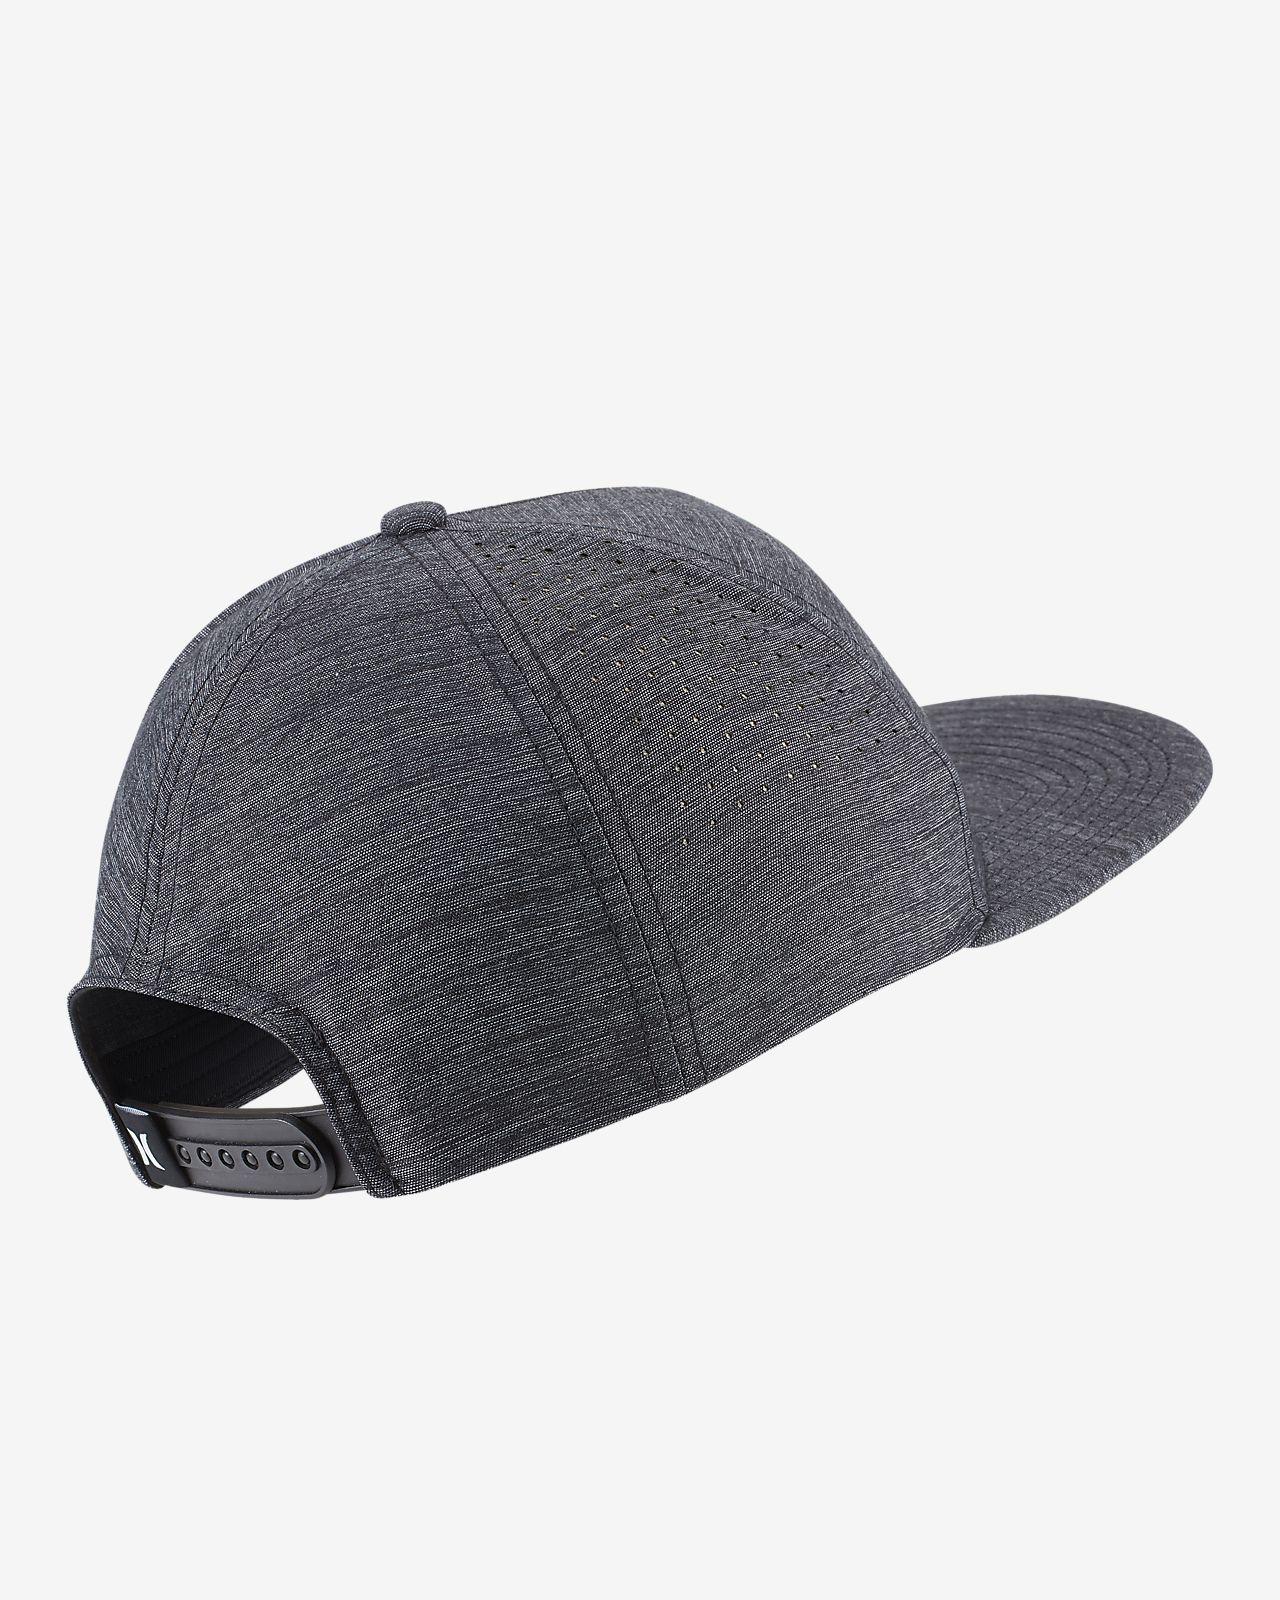 f56b26c155829 Hurley Dri-FIT Staple Adjustable Hat. Nike.com